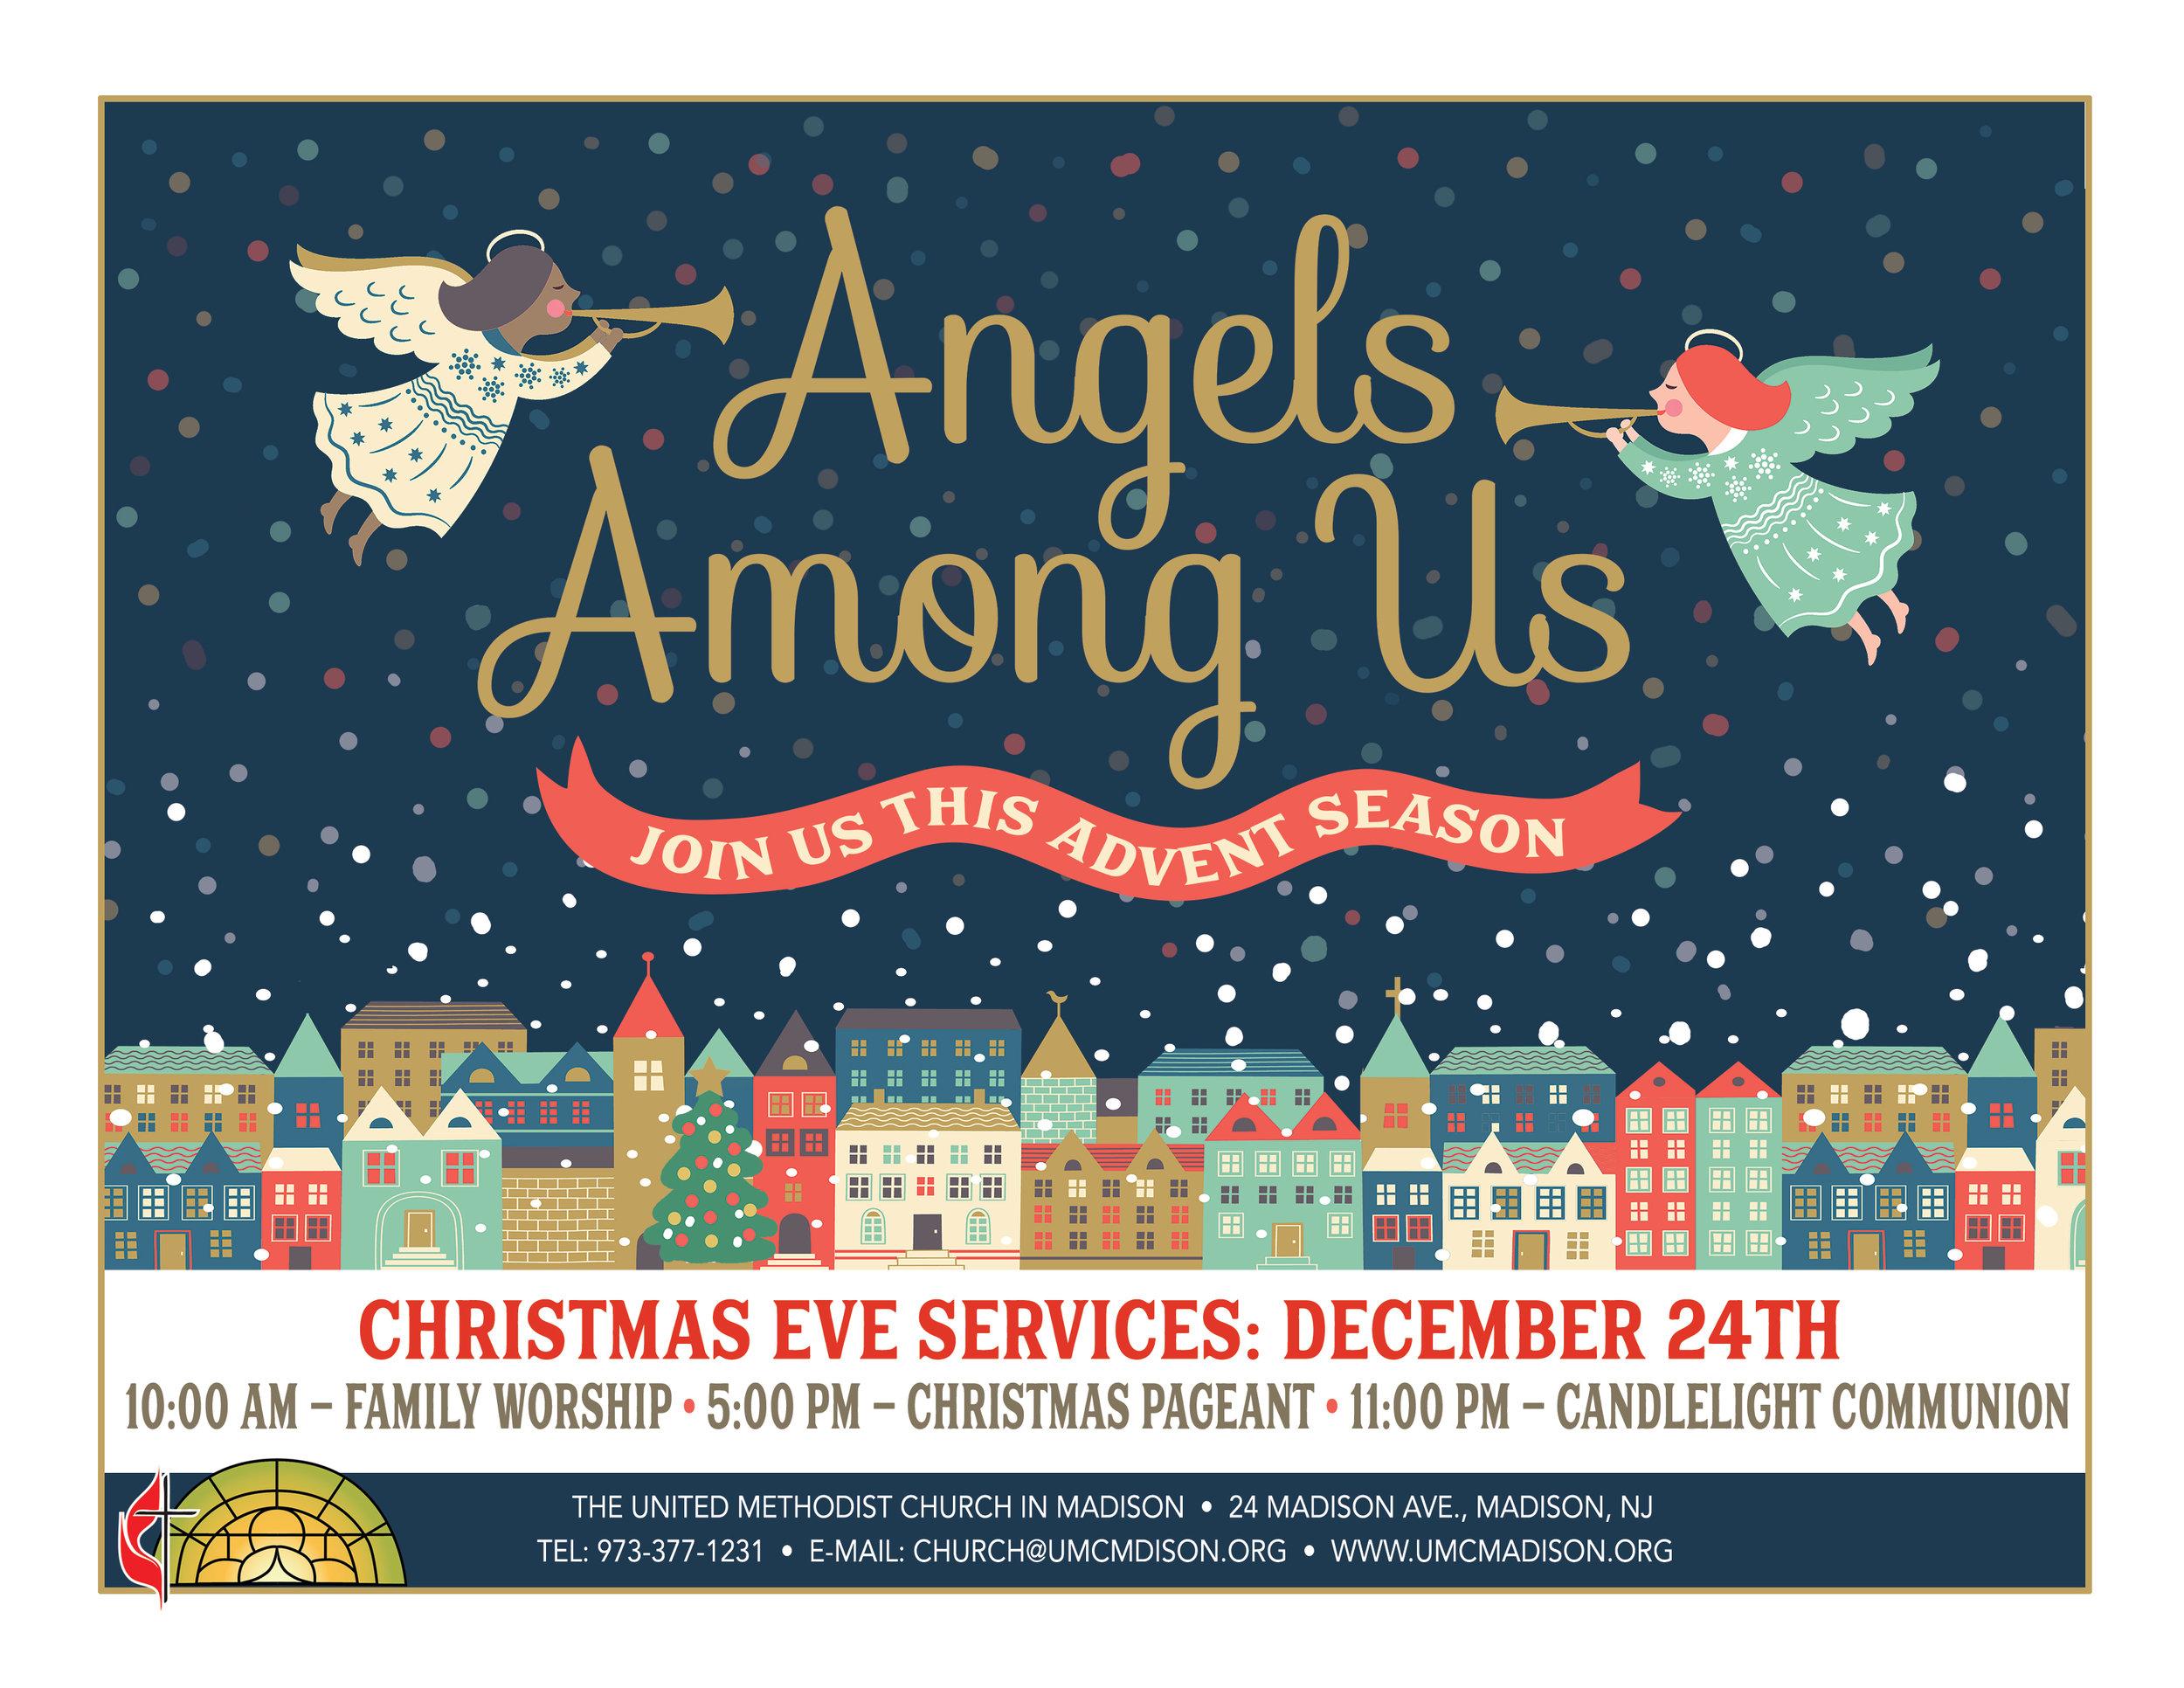 2017 advent angels flyer.jpg